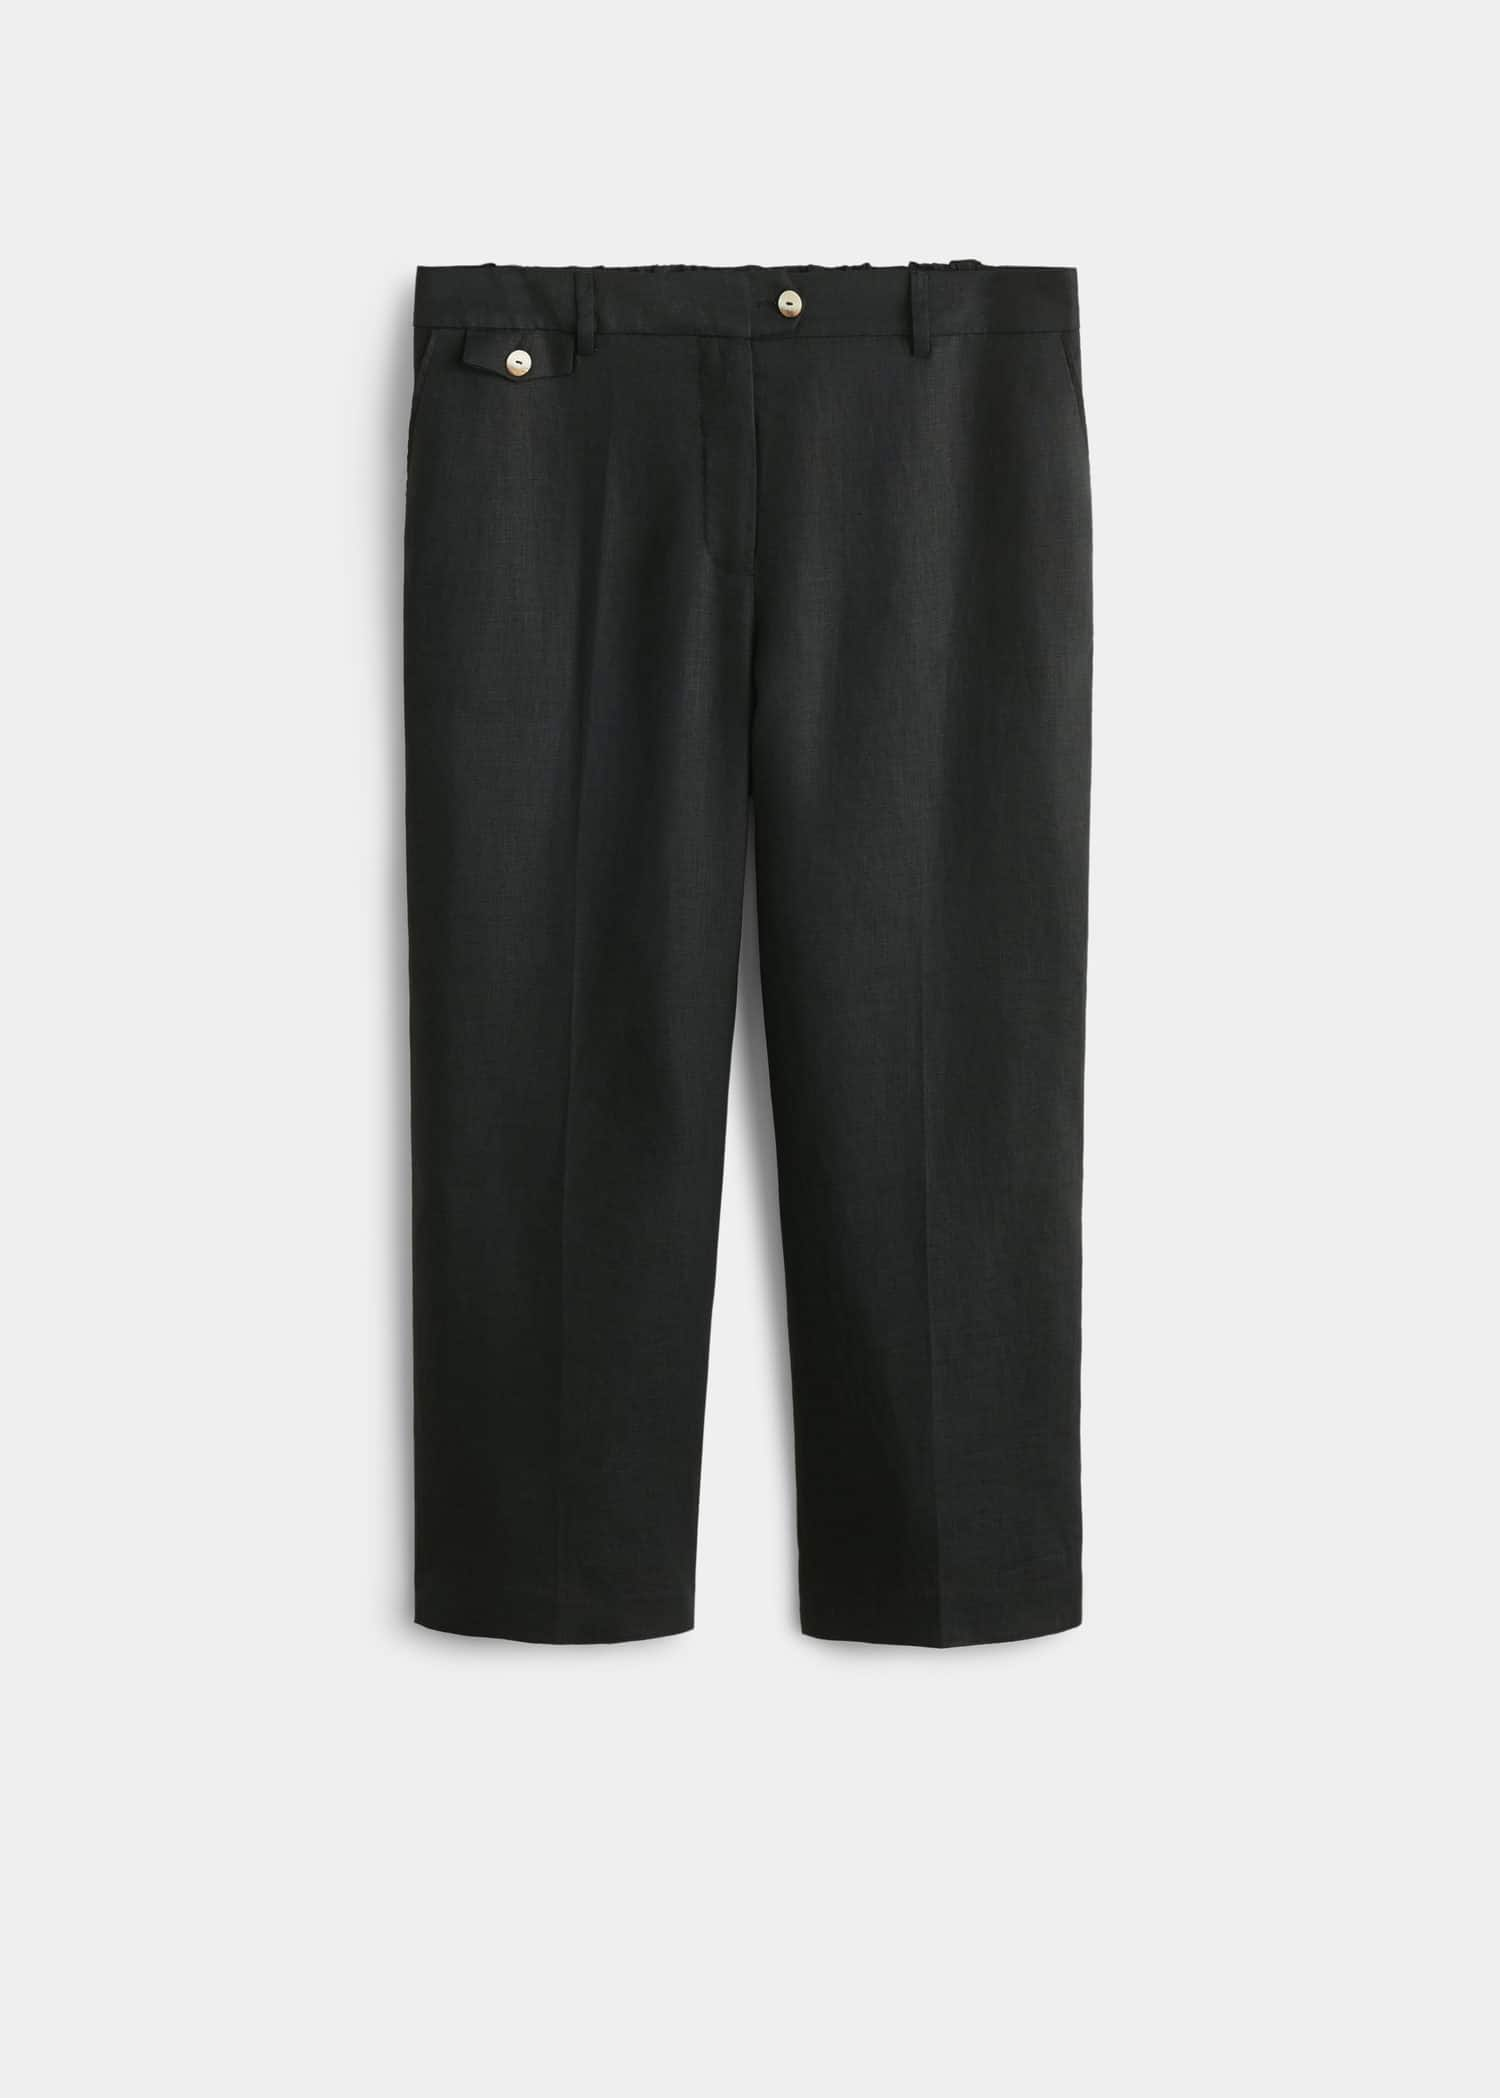 Pantalon droit lin Costumes Grandes tailles | Violeta by